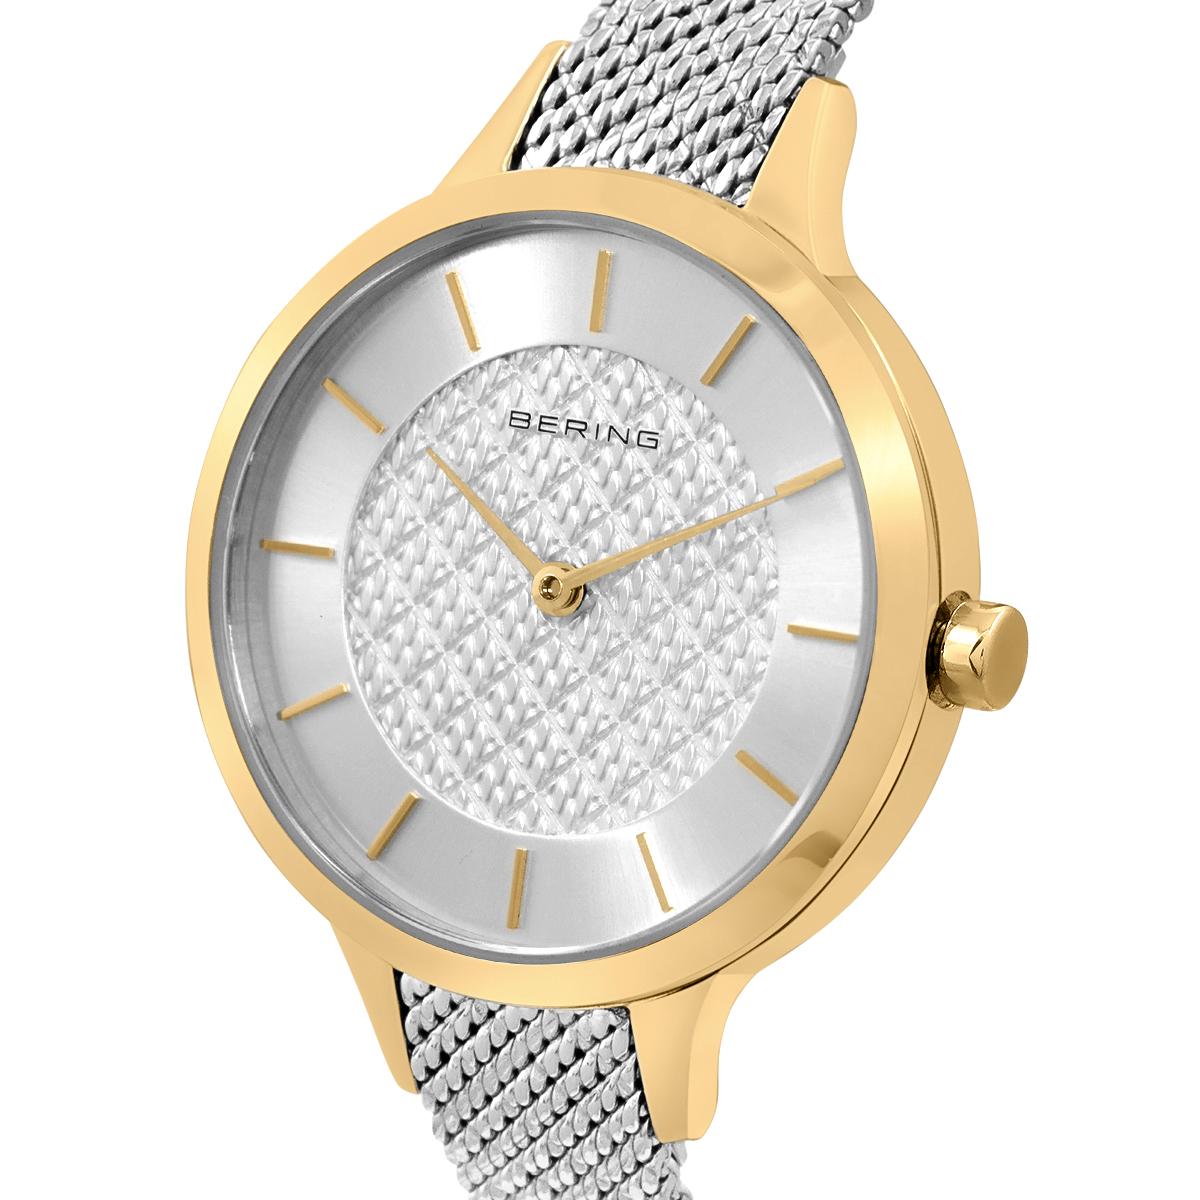 Bering Silver Analogue Women's Watch 17831-010